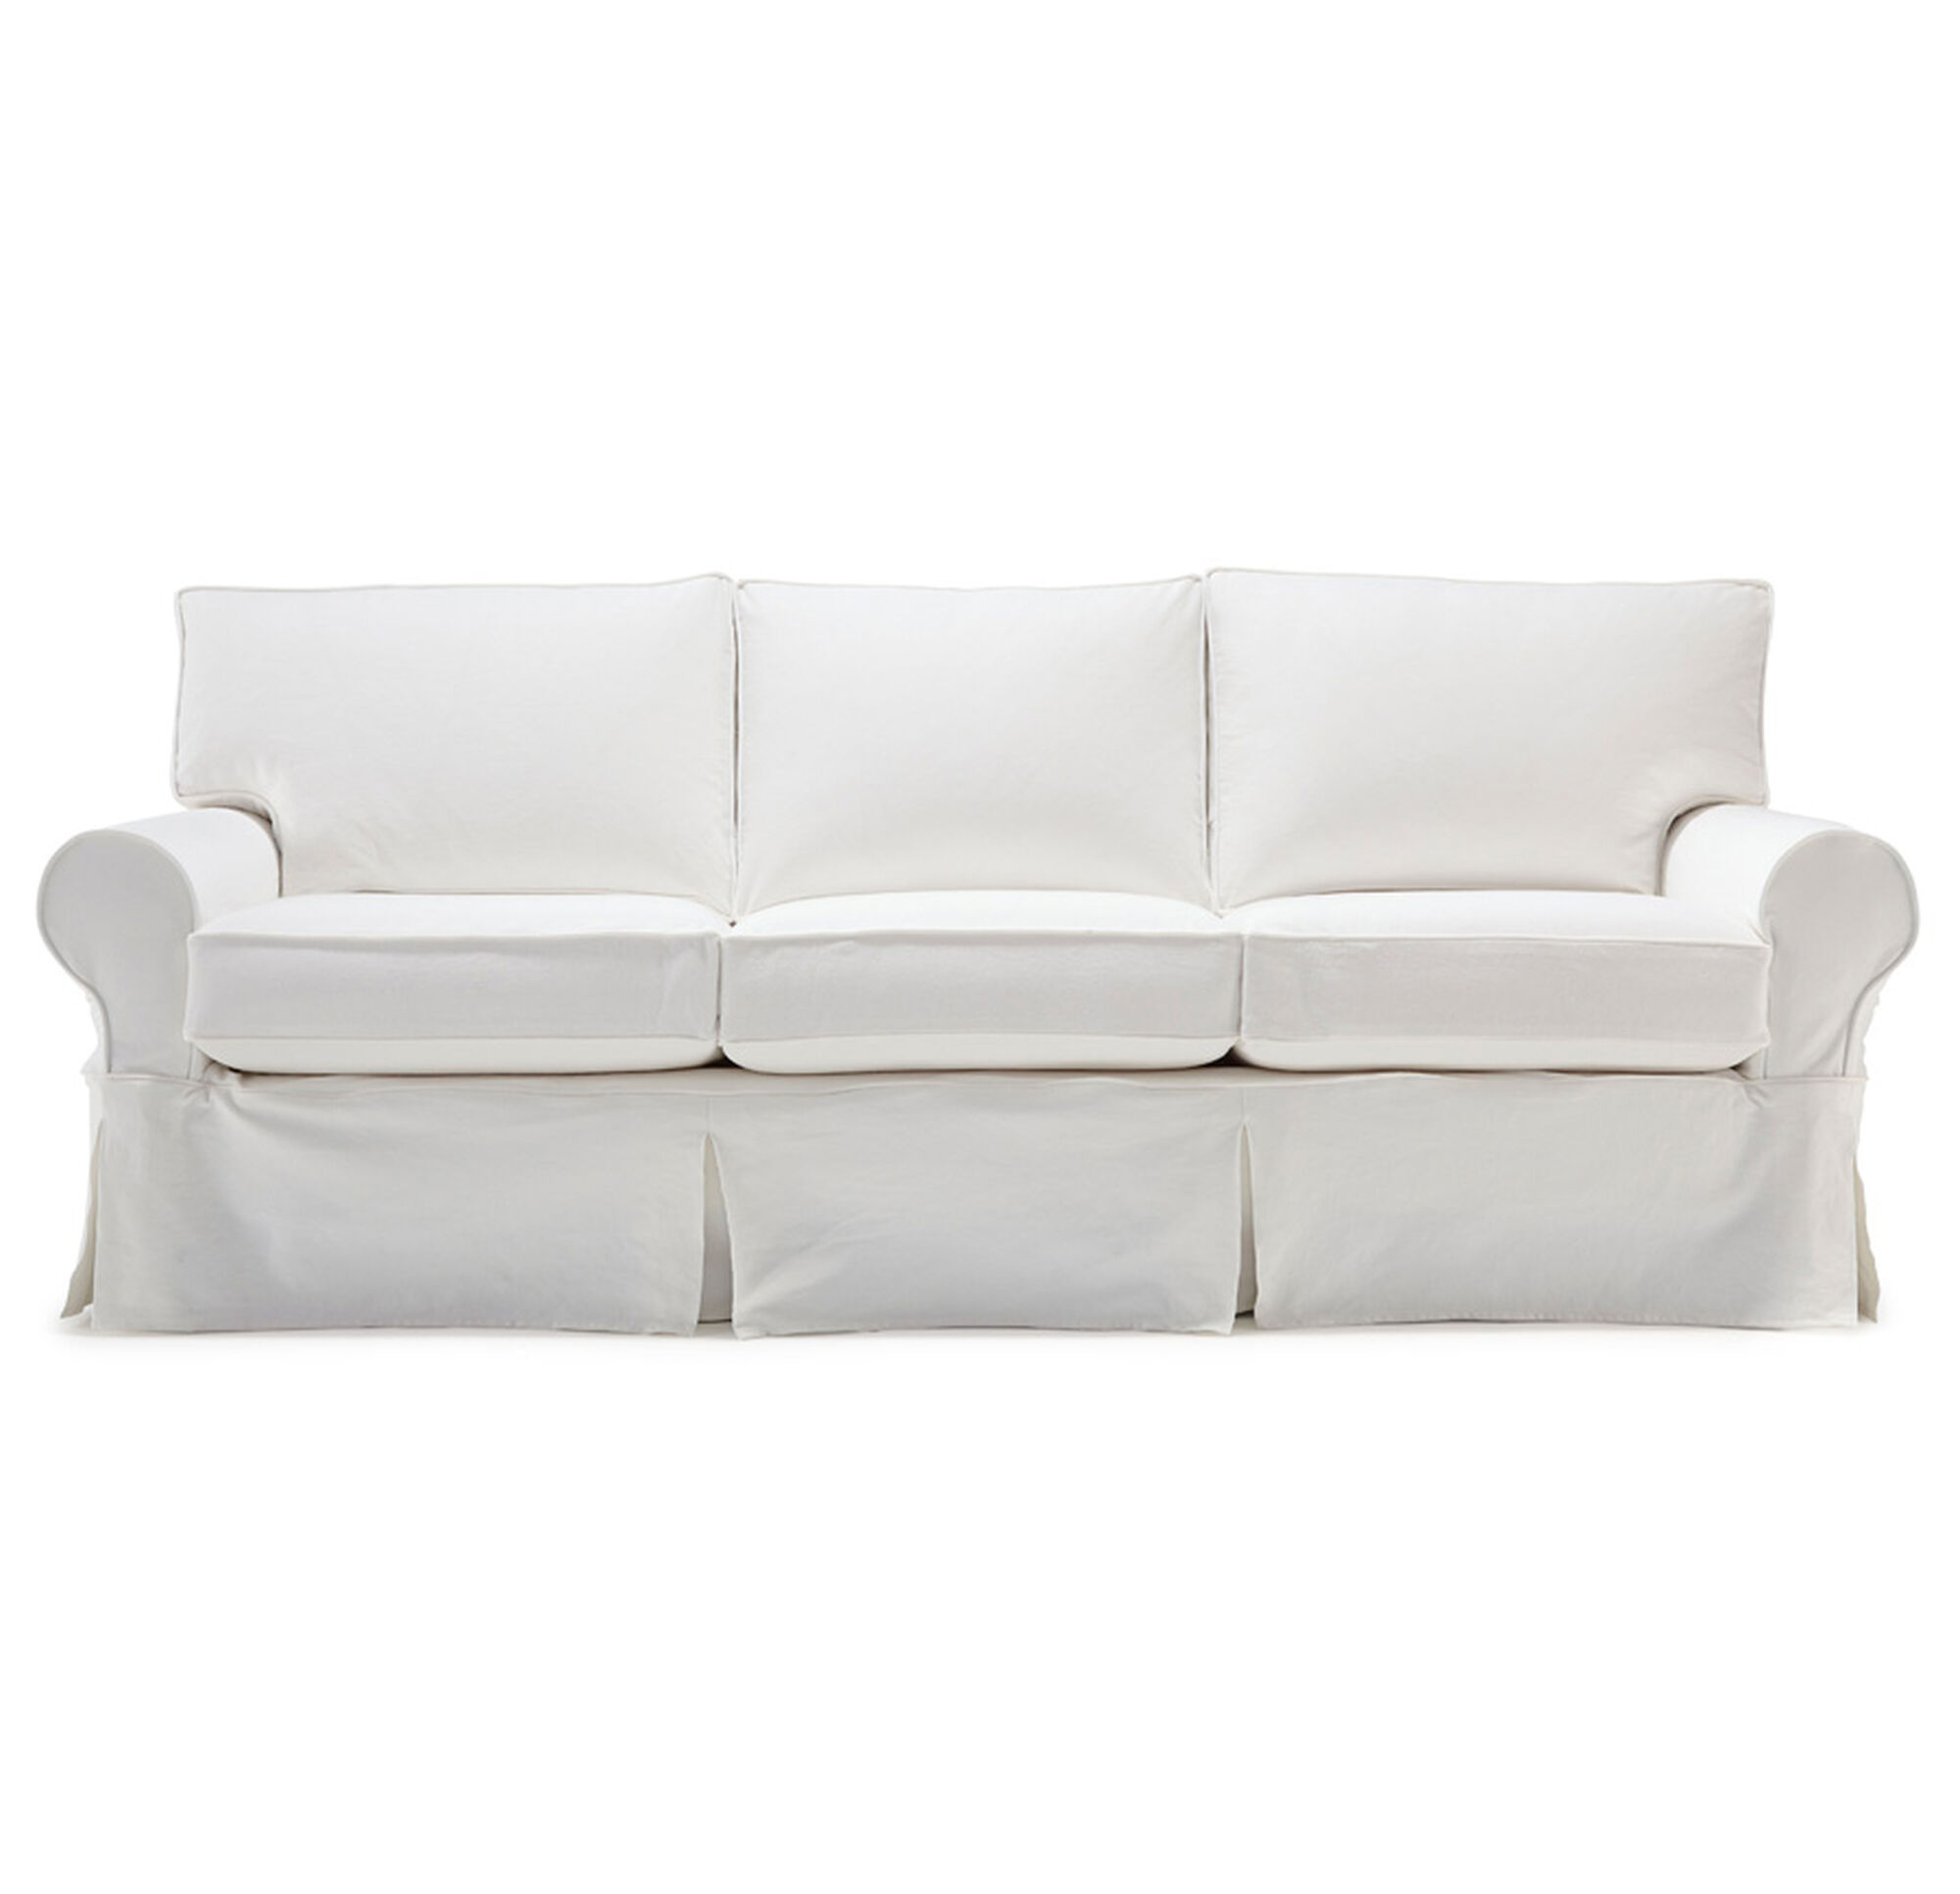 Tremendous Alexa Ii Slipcover Sofa Gamerscity Chair Design For Home Gamerscityorg